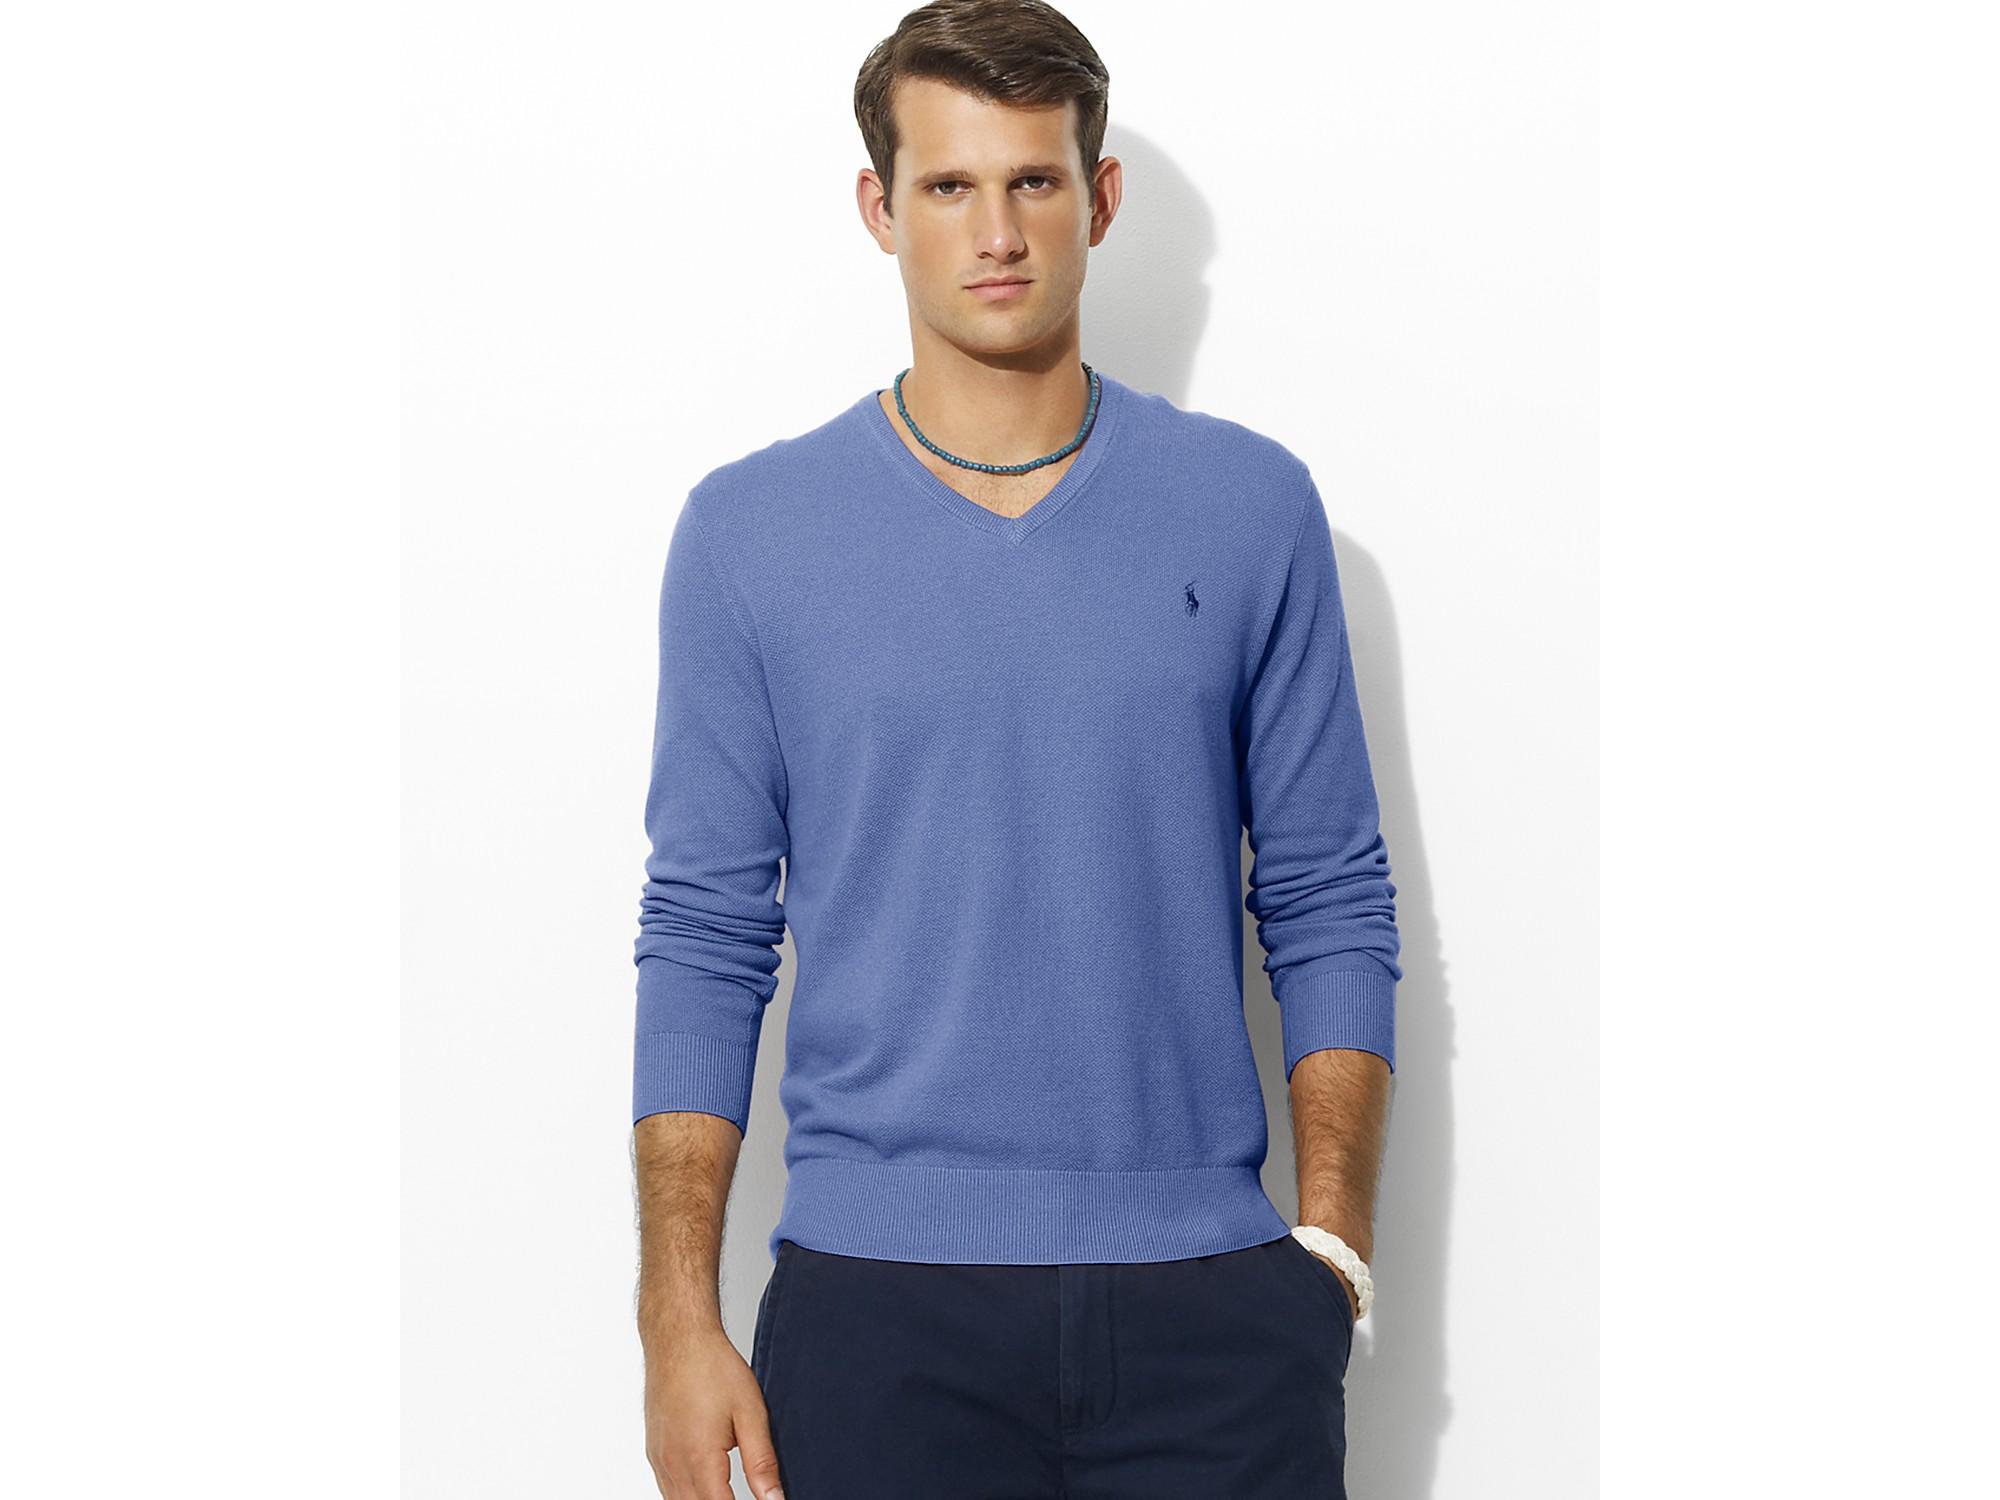 Lyst - Ash Polo Ralph Lauren Long-sleeved Cotton-cashmere V-neck ... 190e9962bf0c